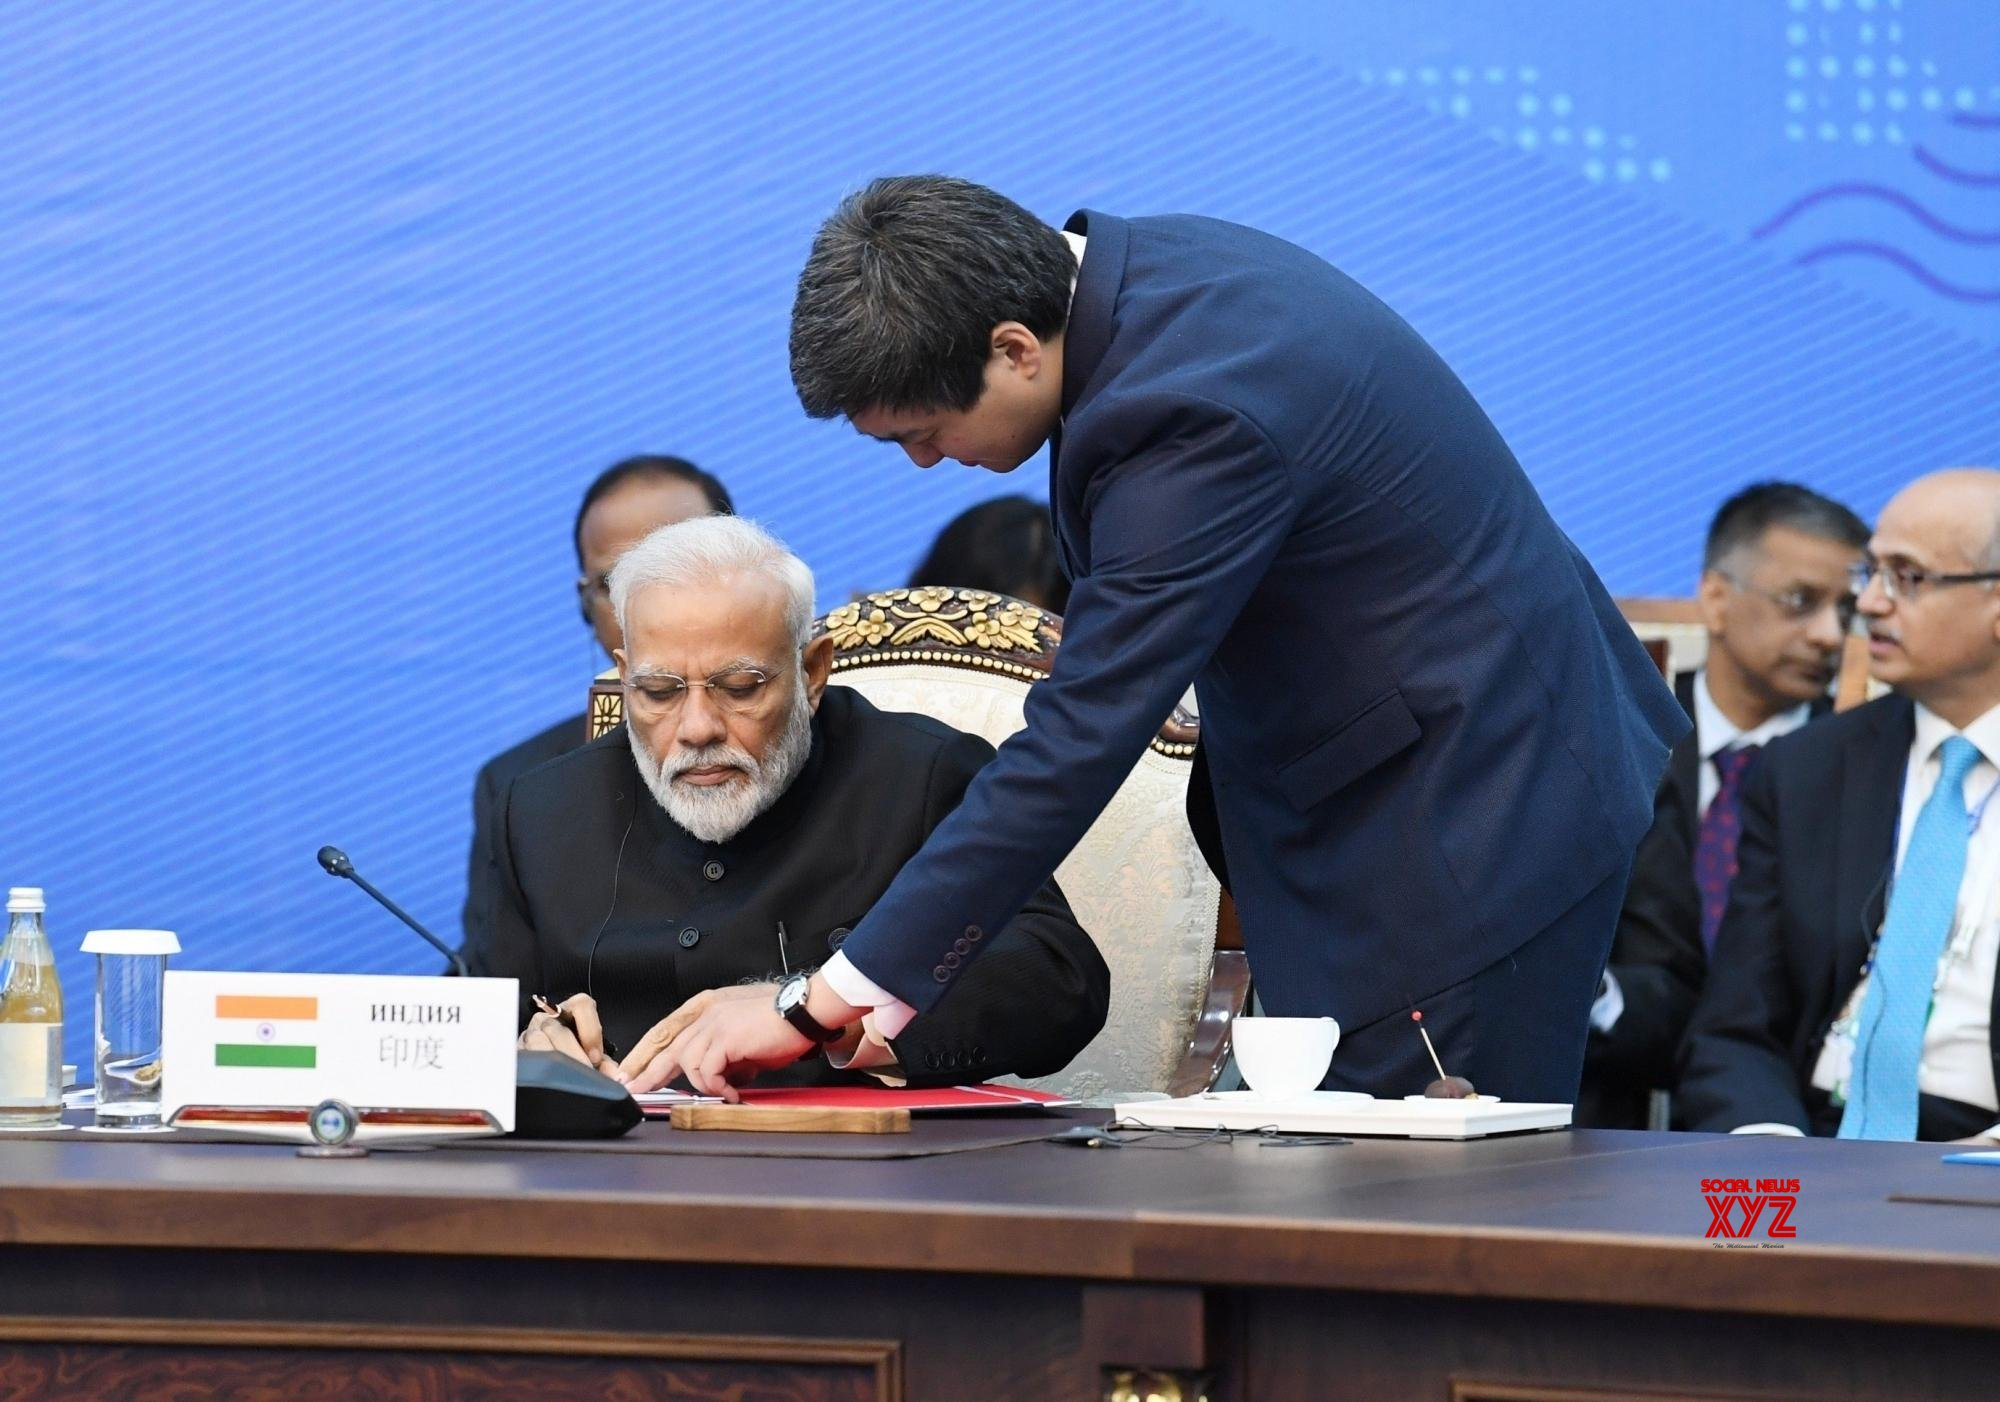 Bishkek (Kyrgyzstan): PM Modi signs documents at 2019 SCO Summit #Gallery